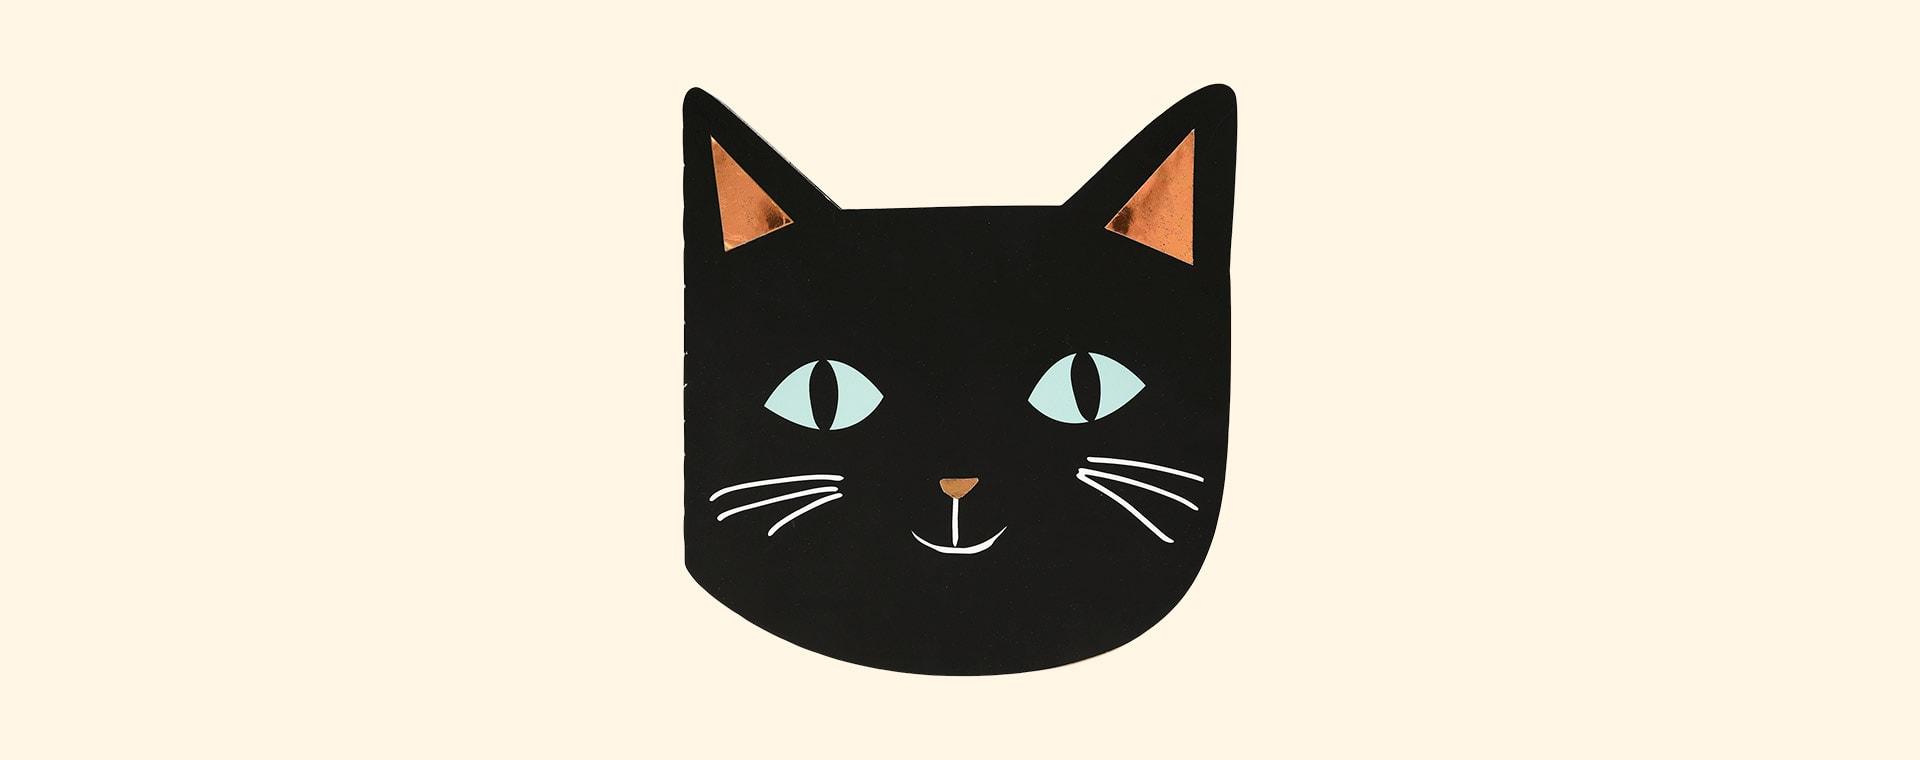 Black Meri Meri Halloween Cat Sticker And Sketch Book